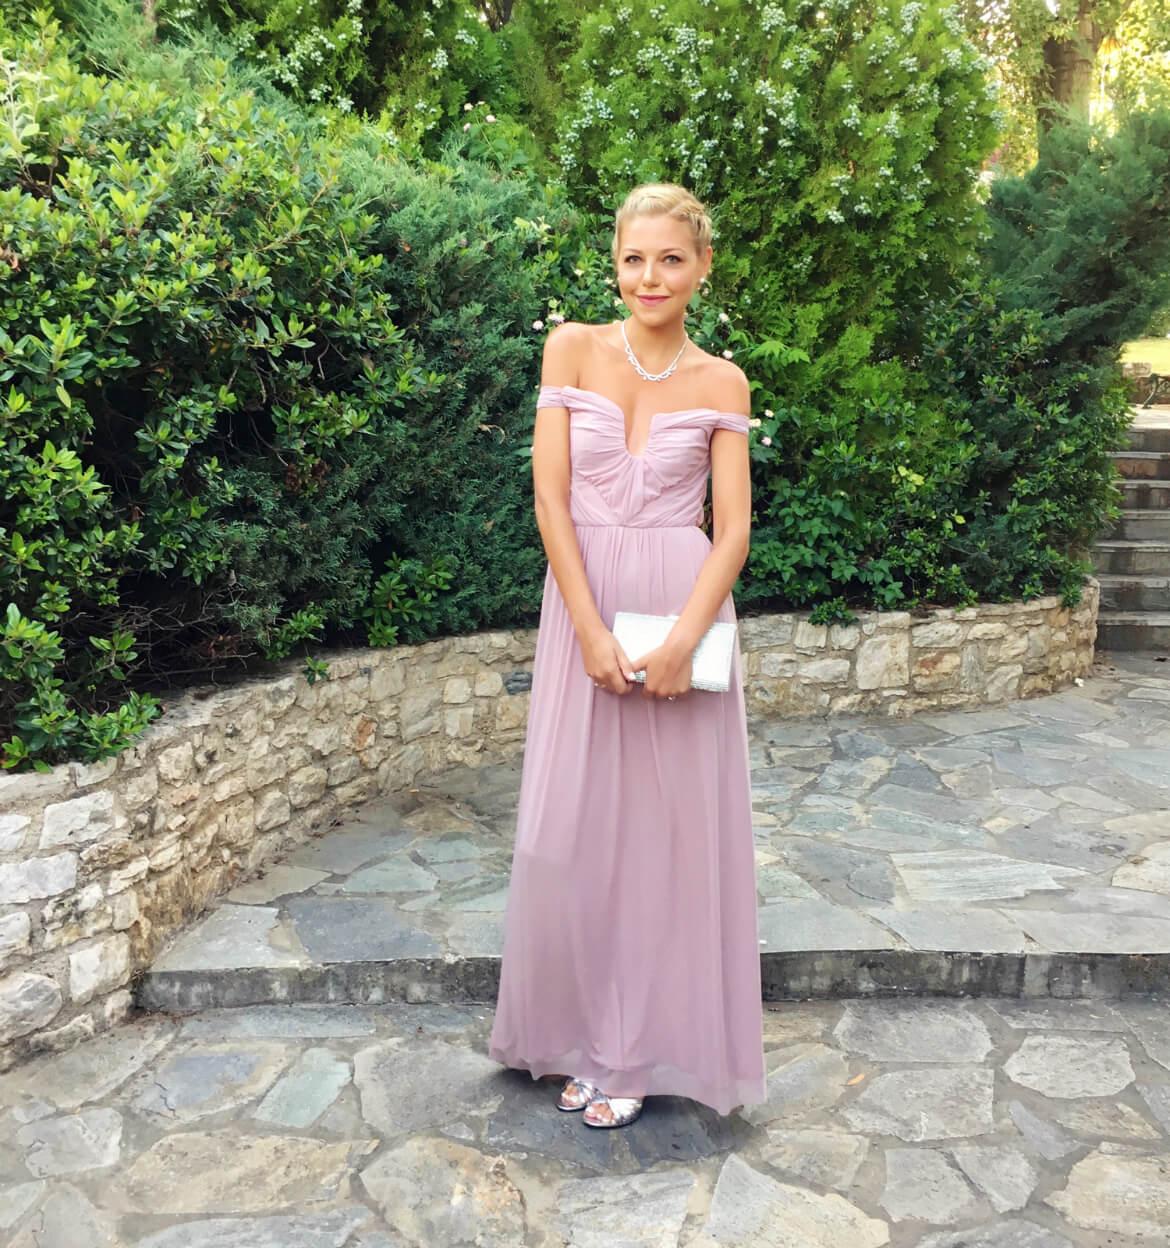 3 Summer Wedding Guest Summerwedding Summerweddingguest Weddingdress Wedding Gown Asos Blonde This Is Sivylla